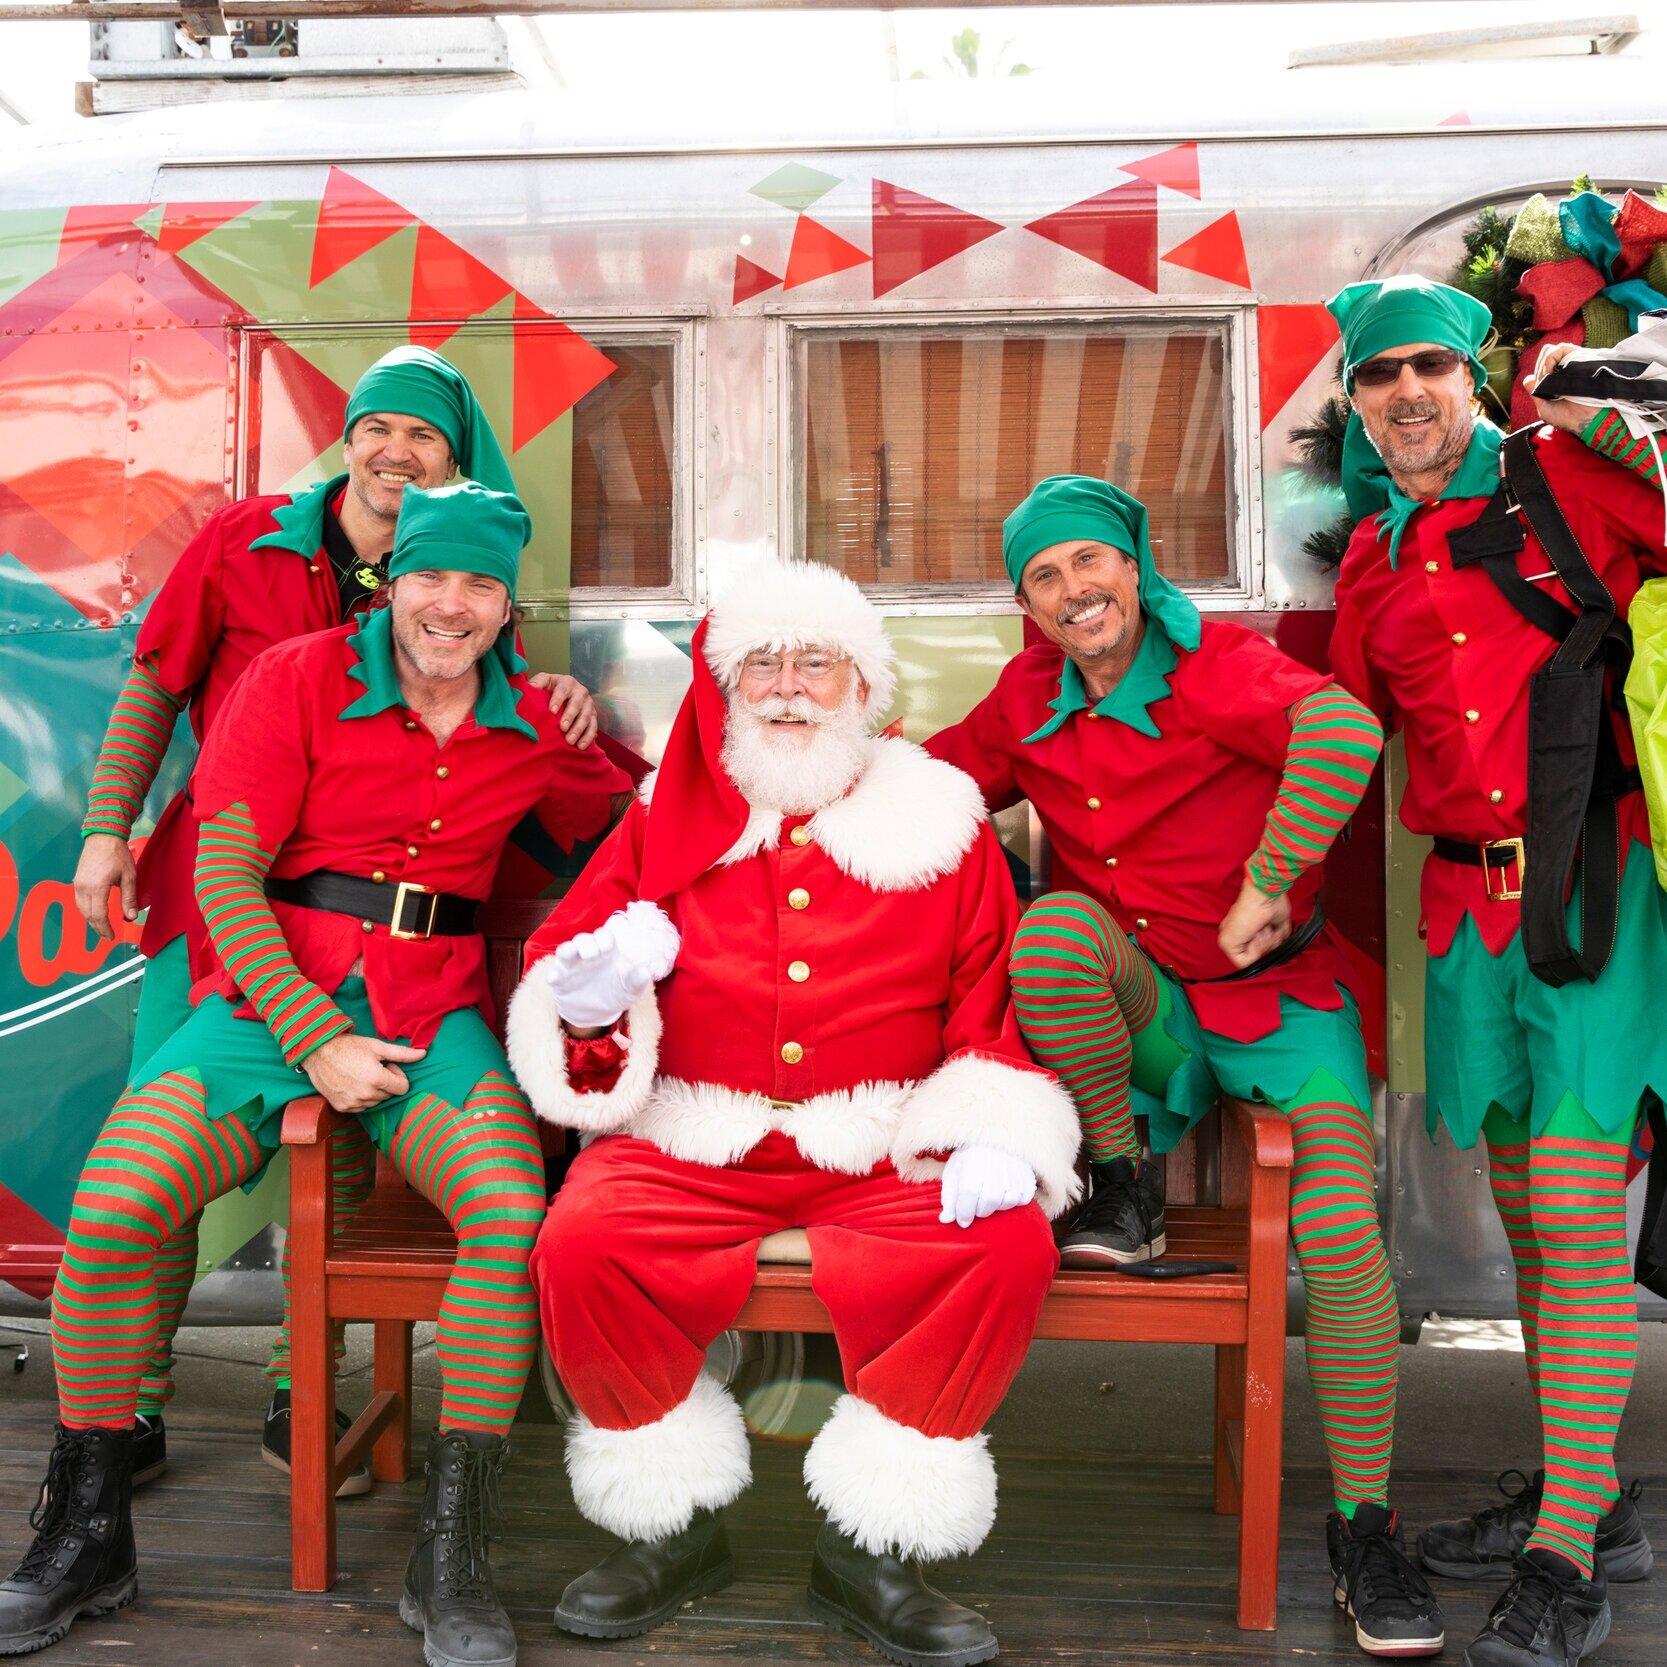 Santa_pacific city_holiday_photos_family.jpg